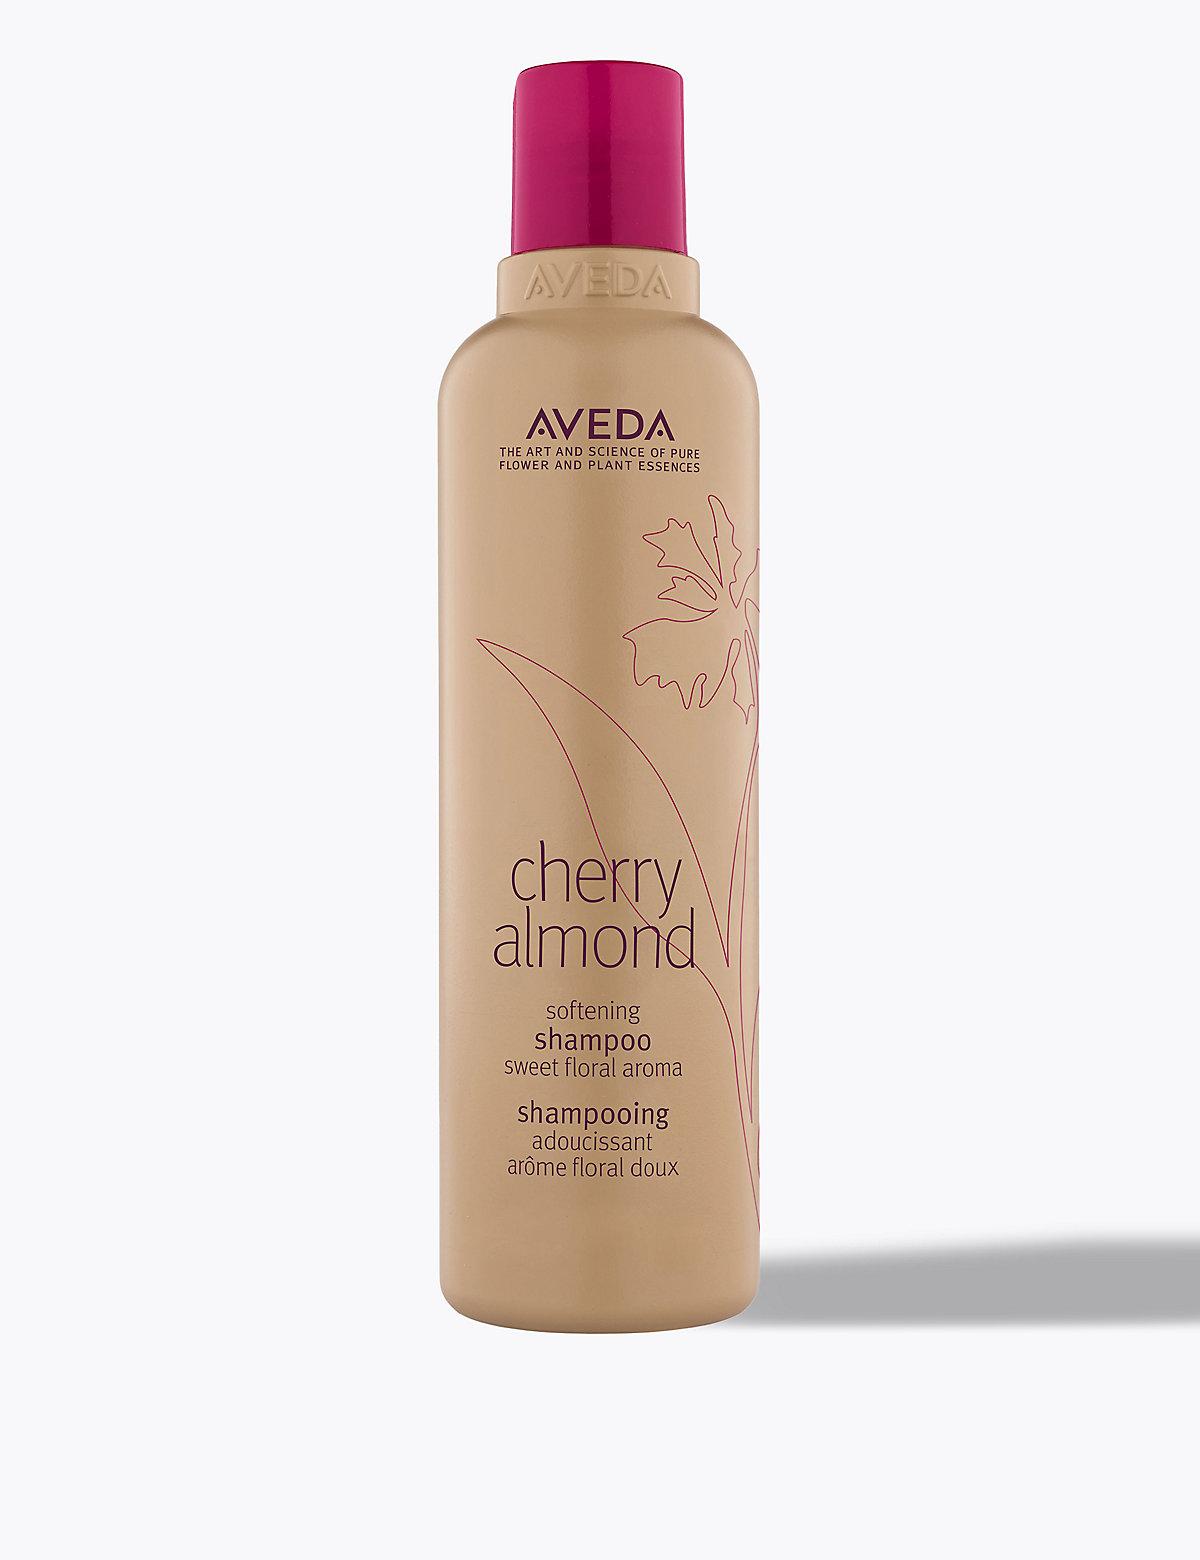 AVEDA Almond Cherry Shampoo 250ml